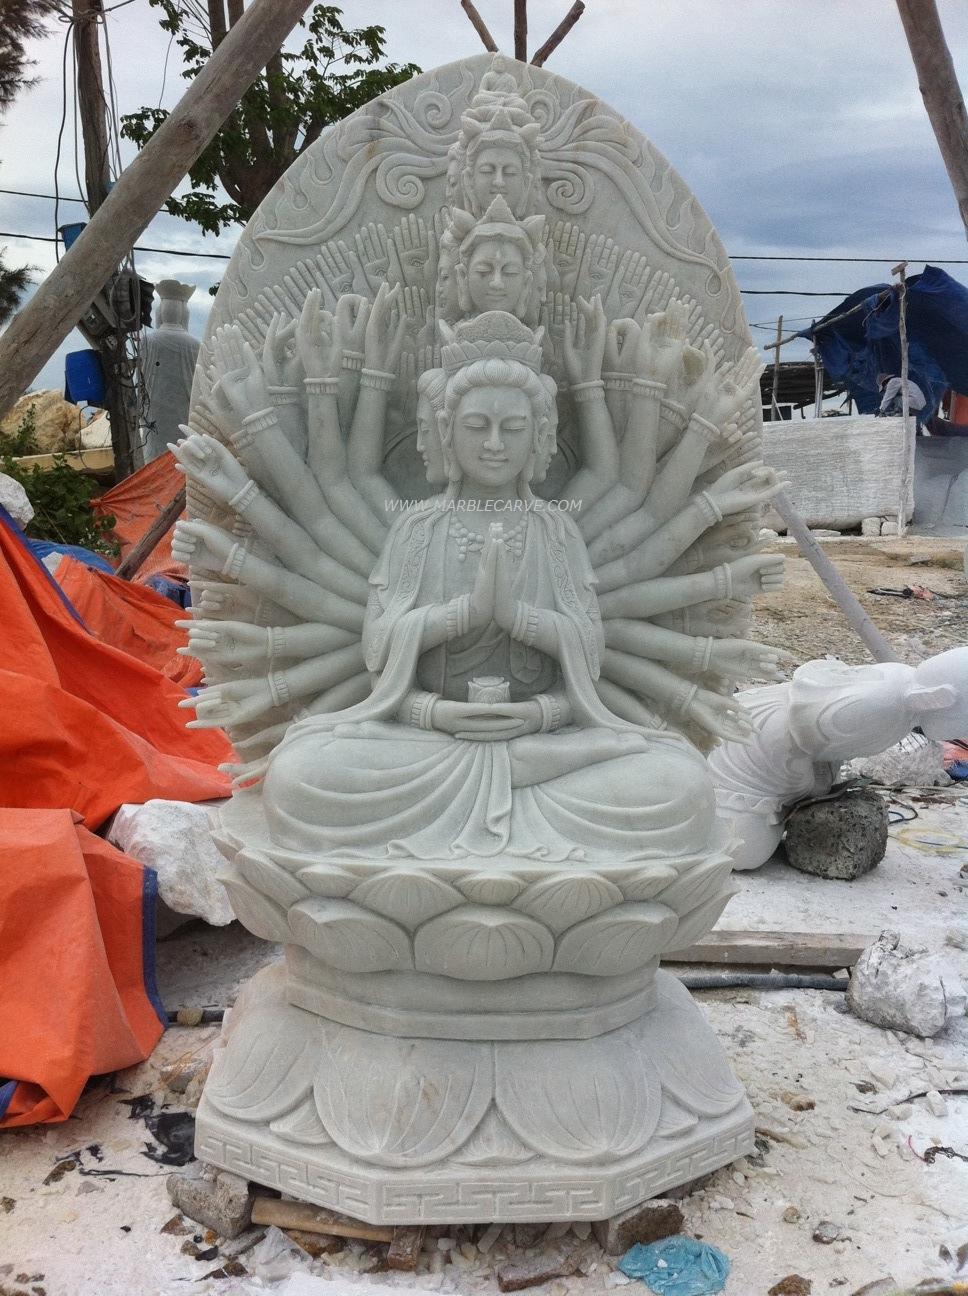 thousand hand Guan Yin carving Sculpture Garden carving